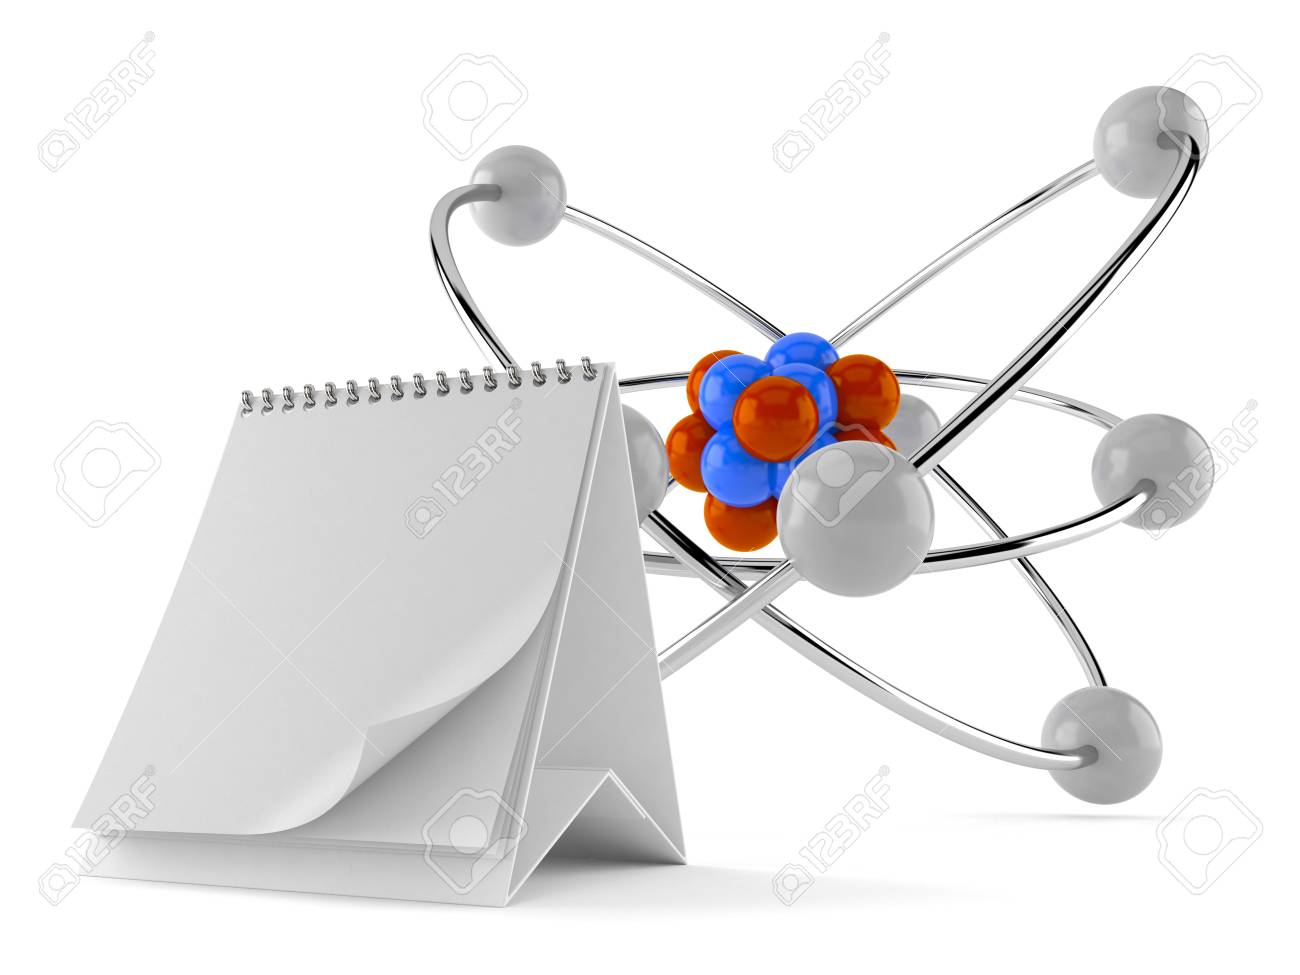 Atom Model With Blank Calendar Isolated On White Background. 3d  Illustration Stock Illustration   105638462